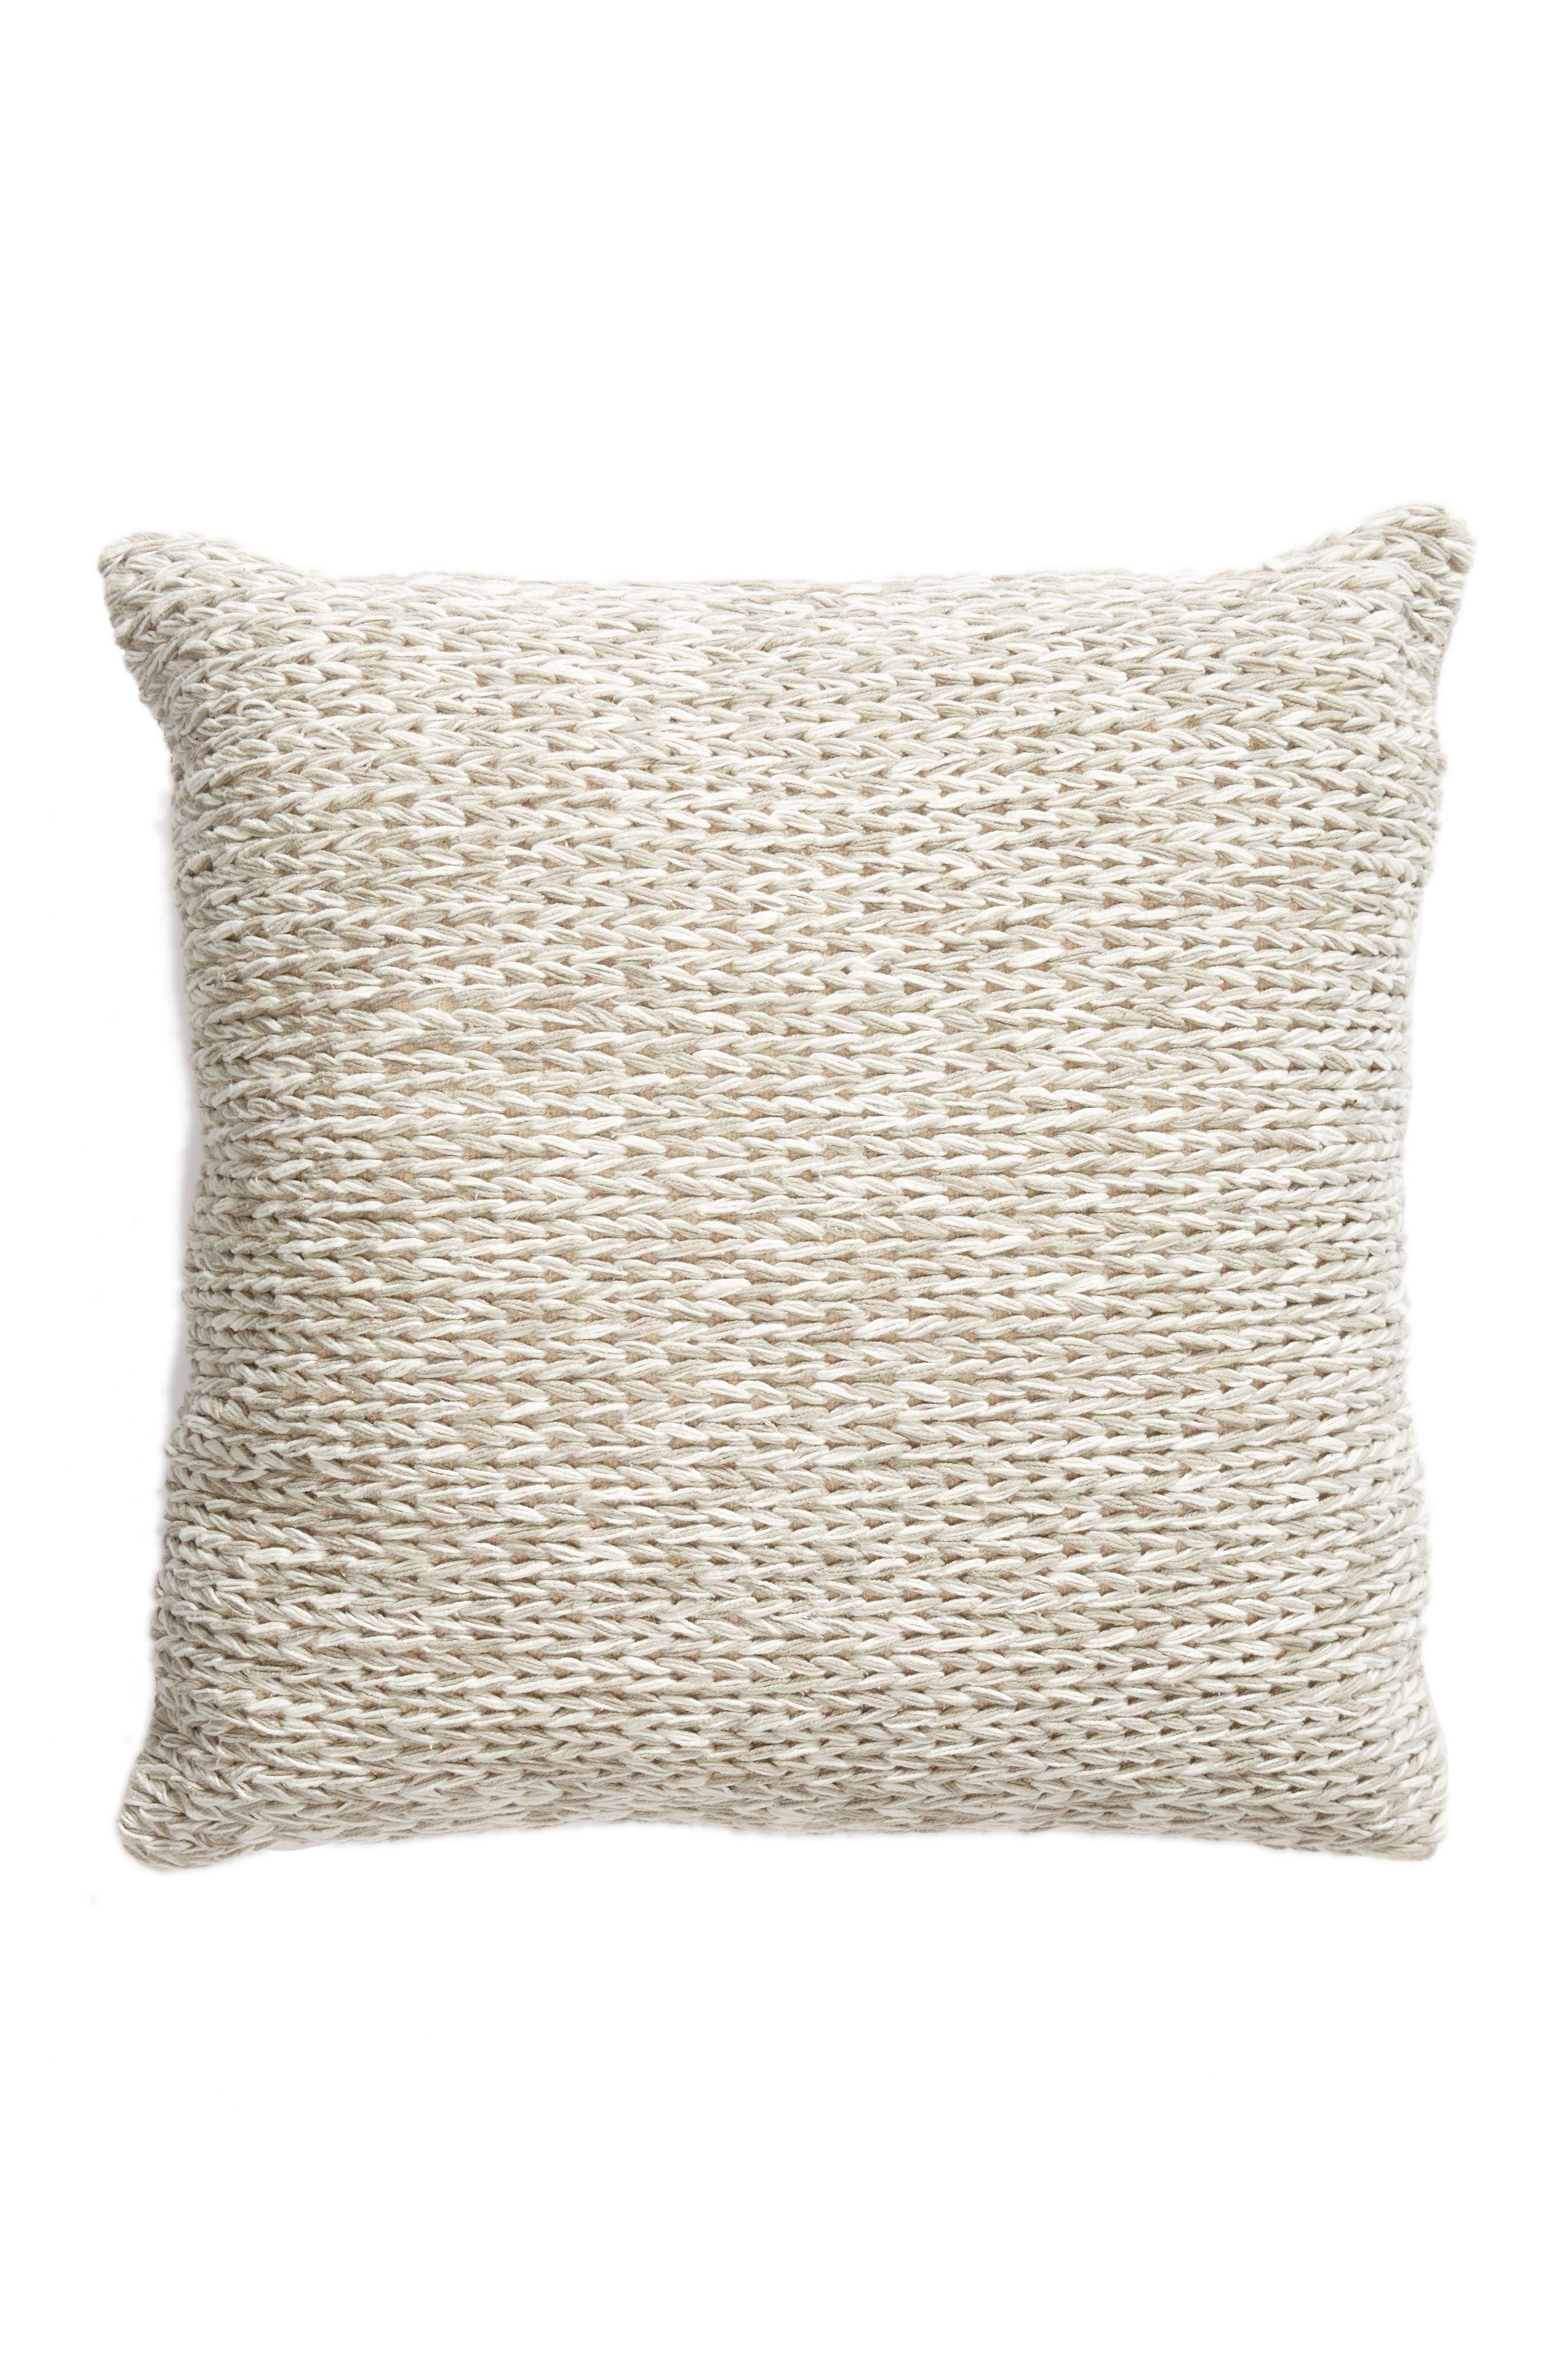 Knit Floor Pillow,                             Main thumbnail 1, color,                             Grey Owl